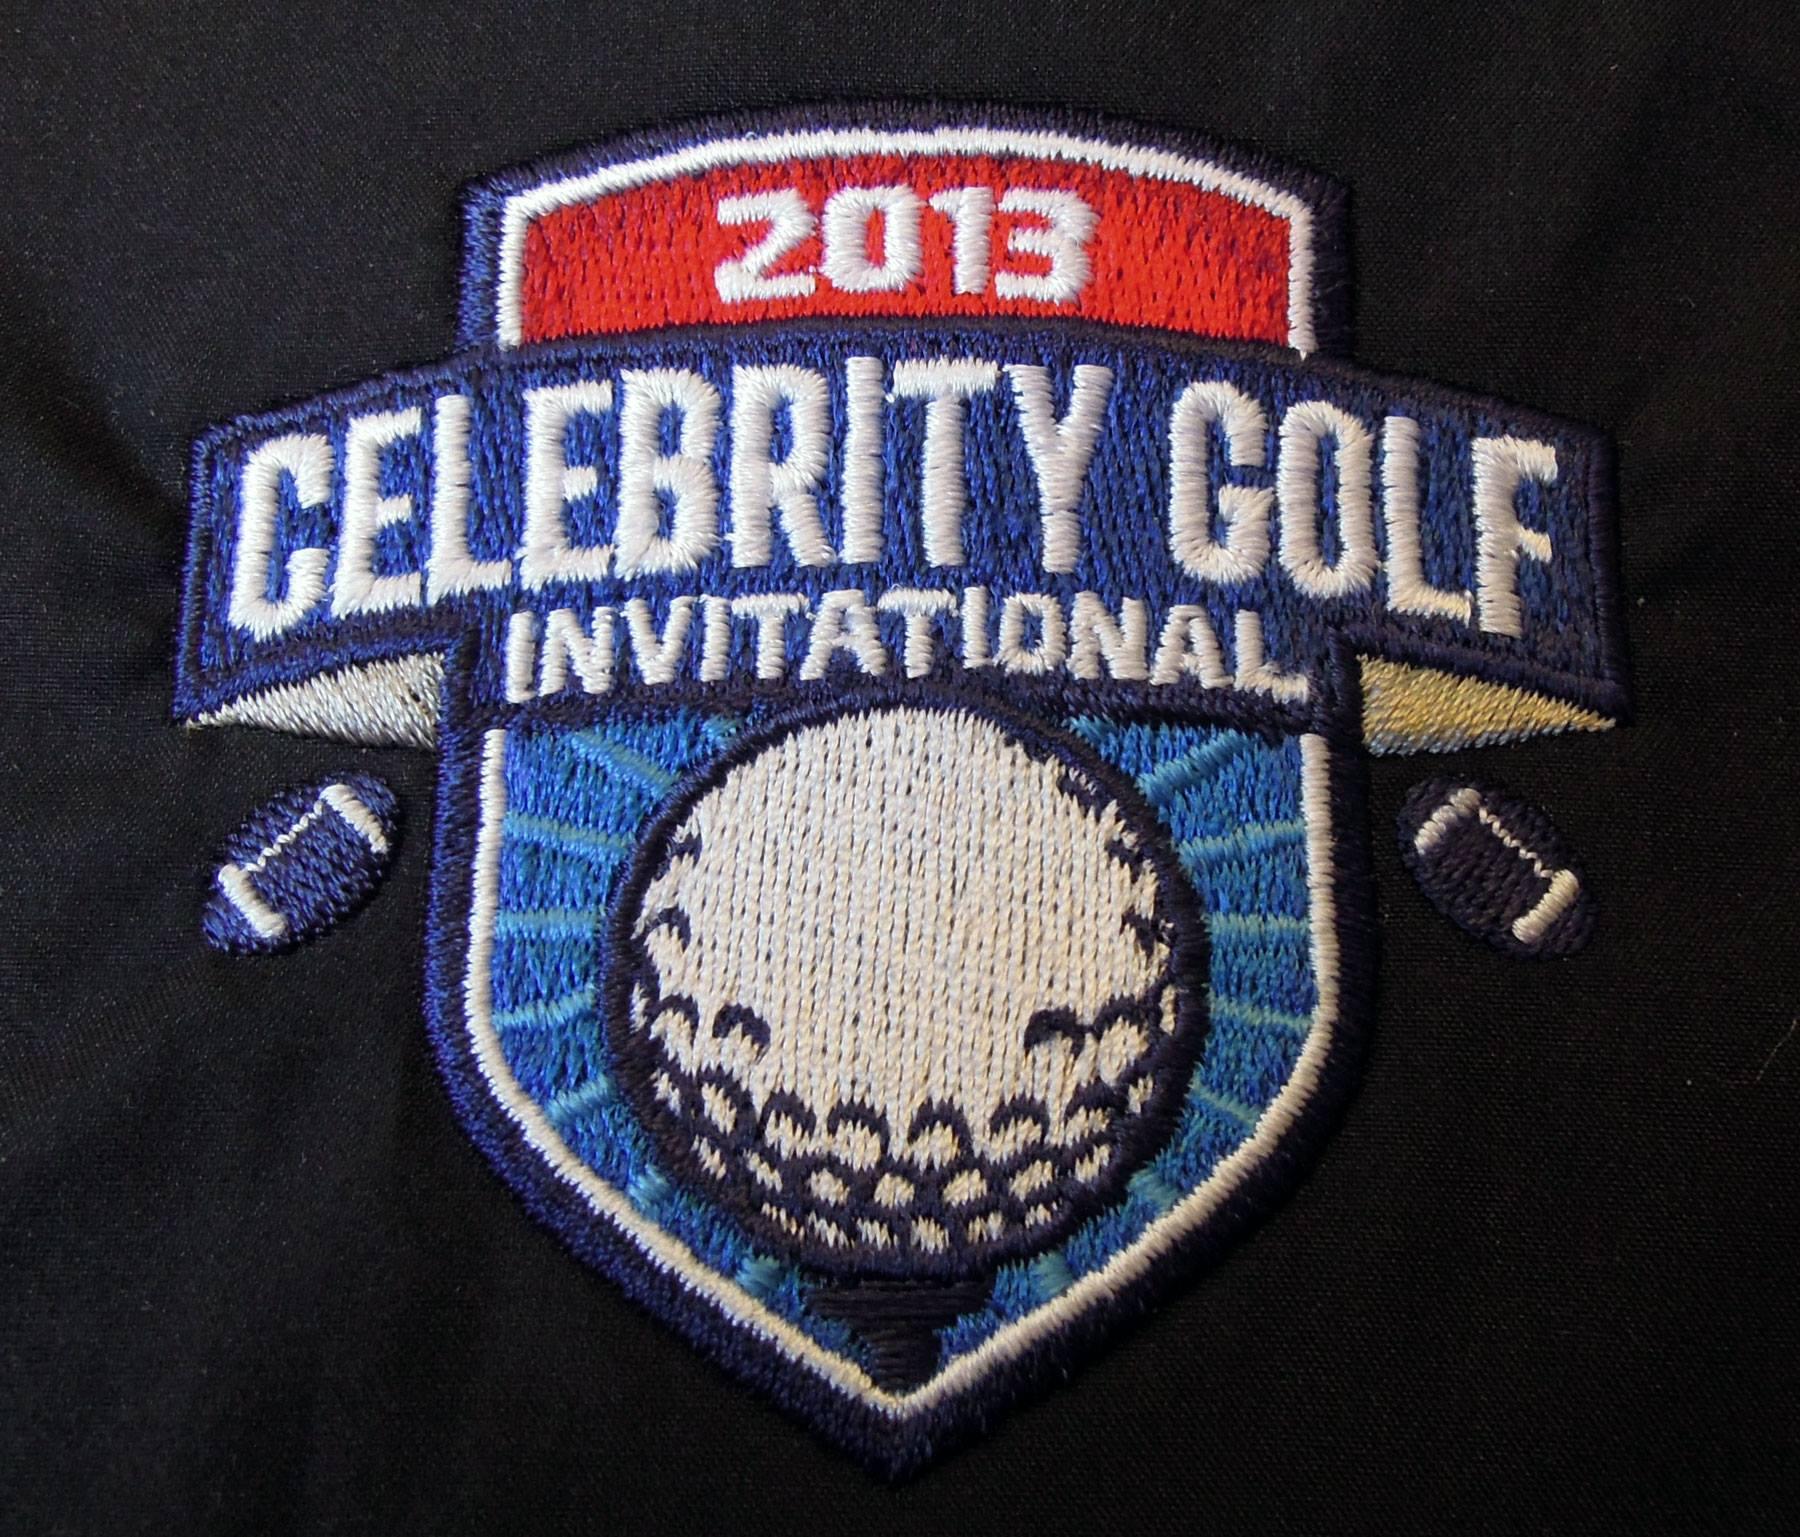 Celebrity Golf Invitational Gear